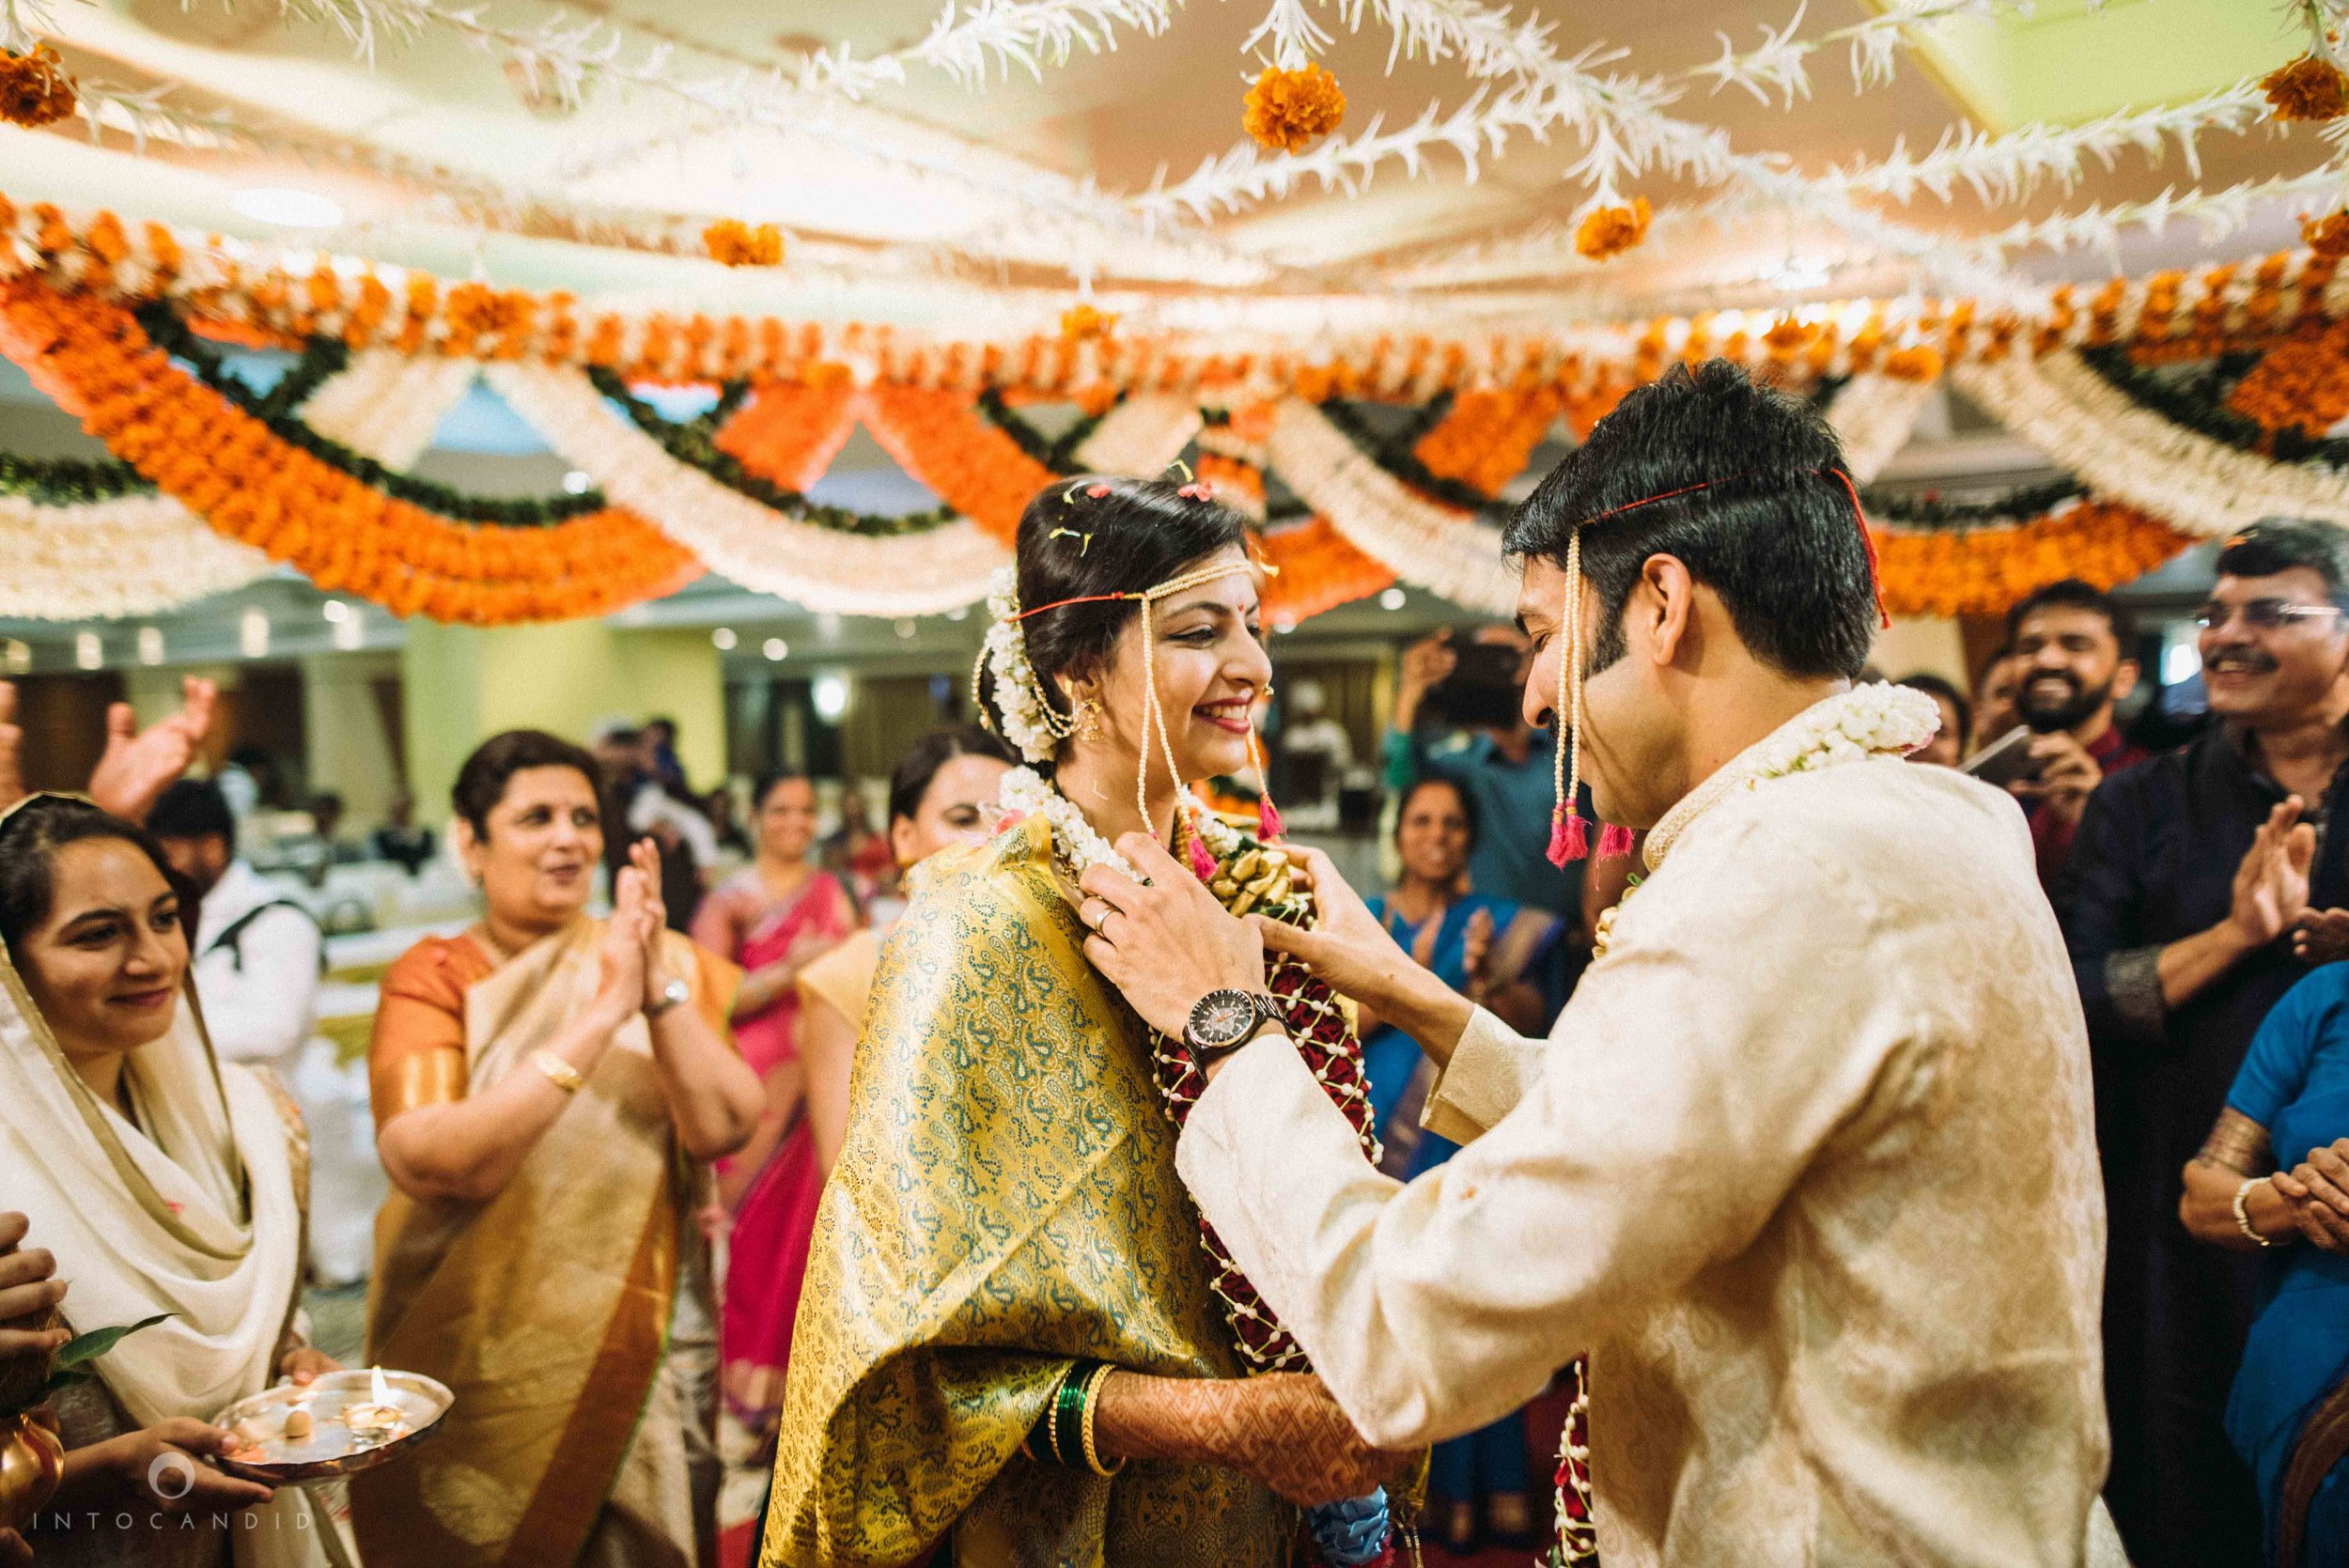 Bangalore_Wedding_Photographer_Indian_Wedding_Photography_77.jpg